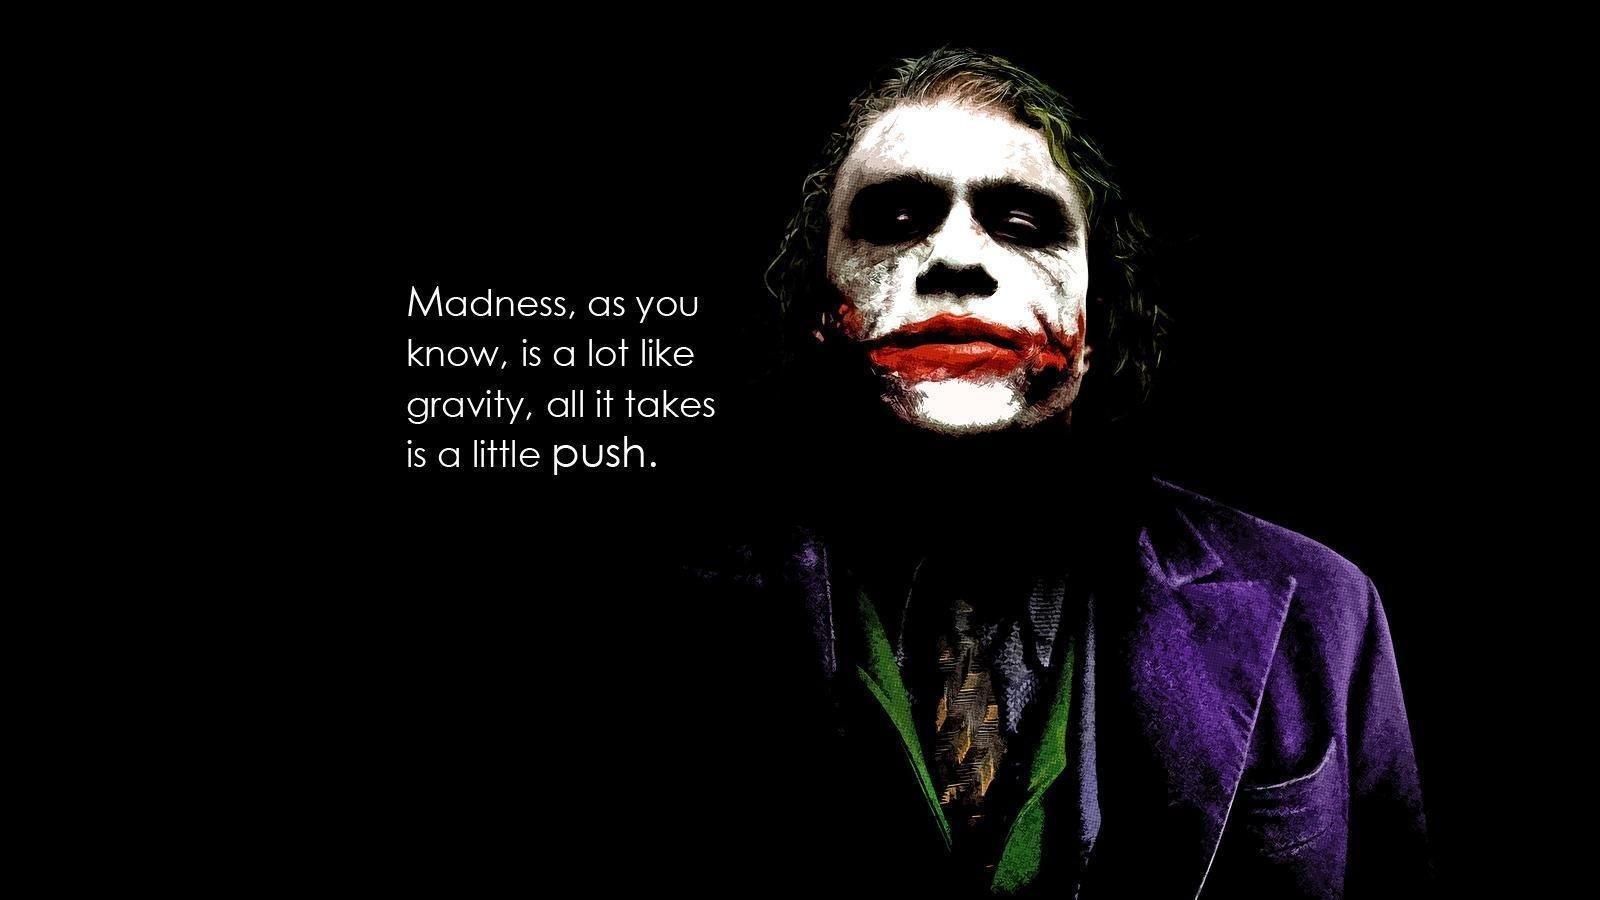 Inspirational Quotes Joker Quotes Wallpaper Hd 1600x900